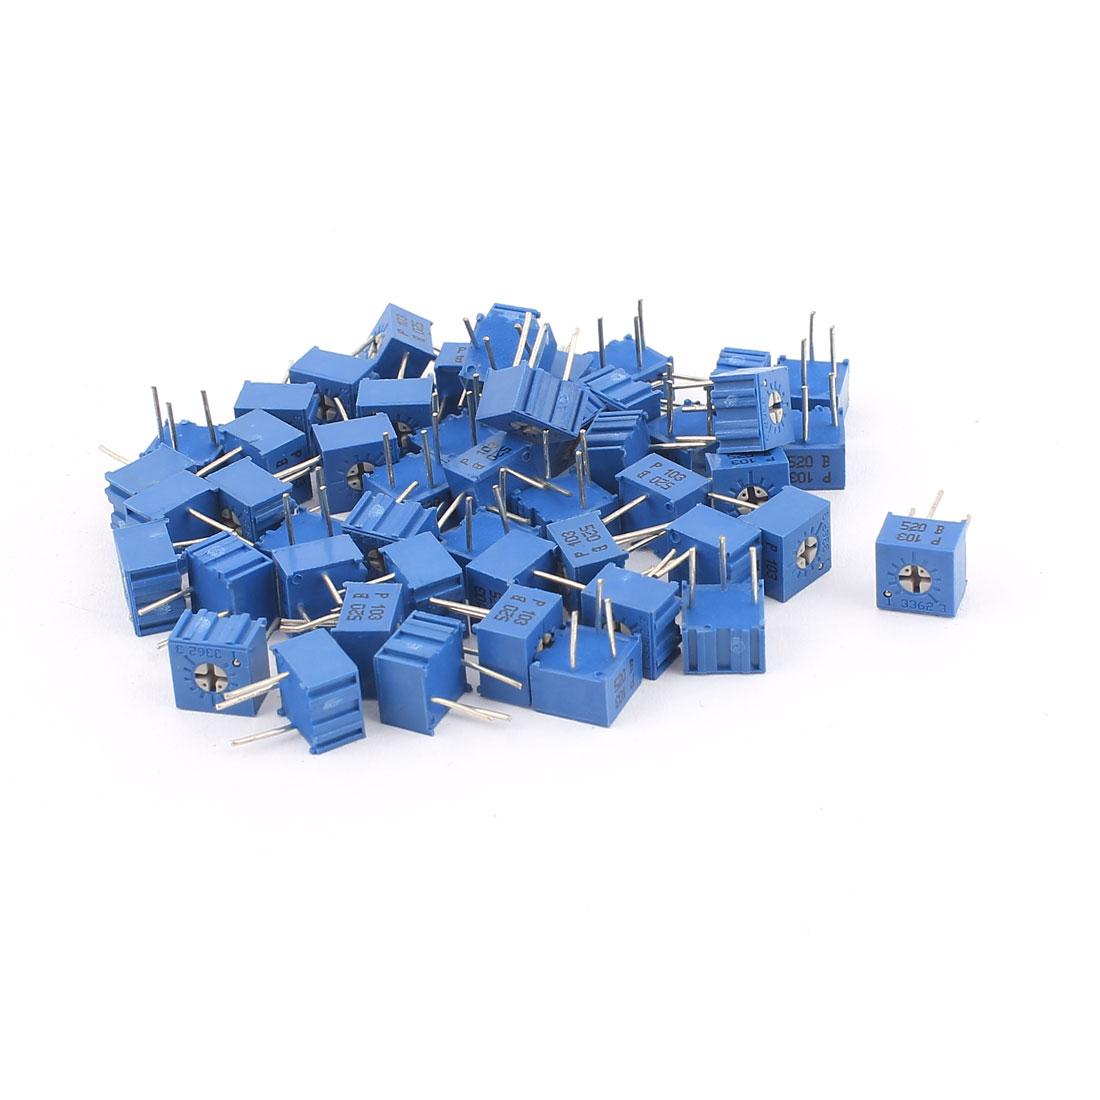 50Pcs Adjustable Potentiometer Trimmer Variable Resistor 3362P-103 10K Ohm